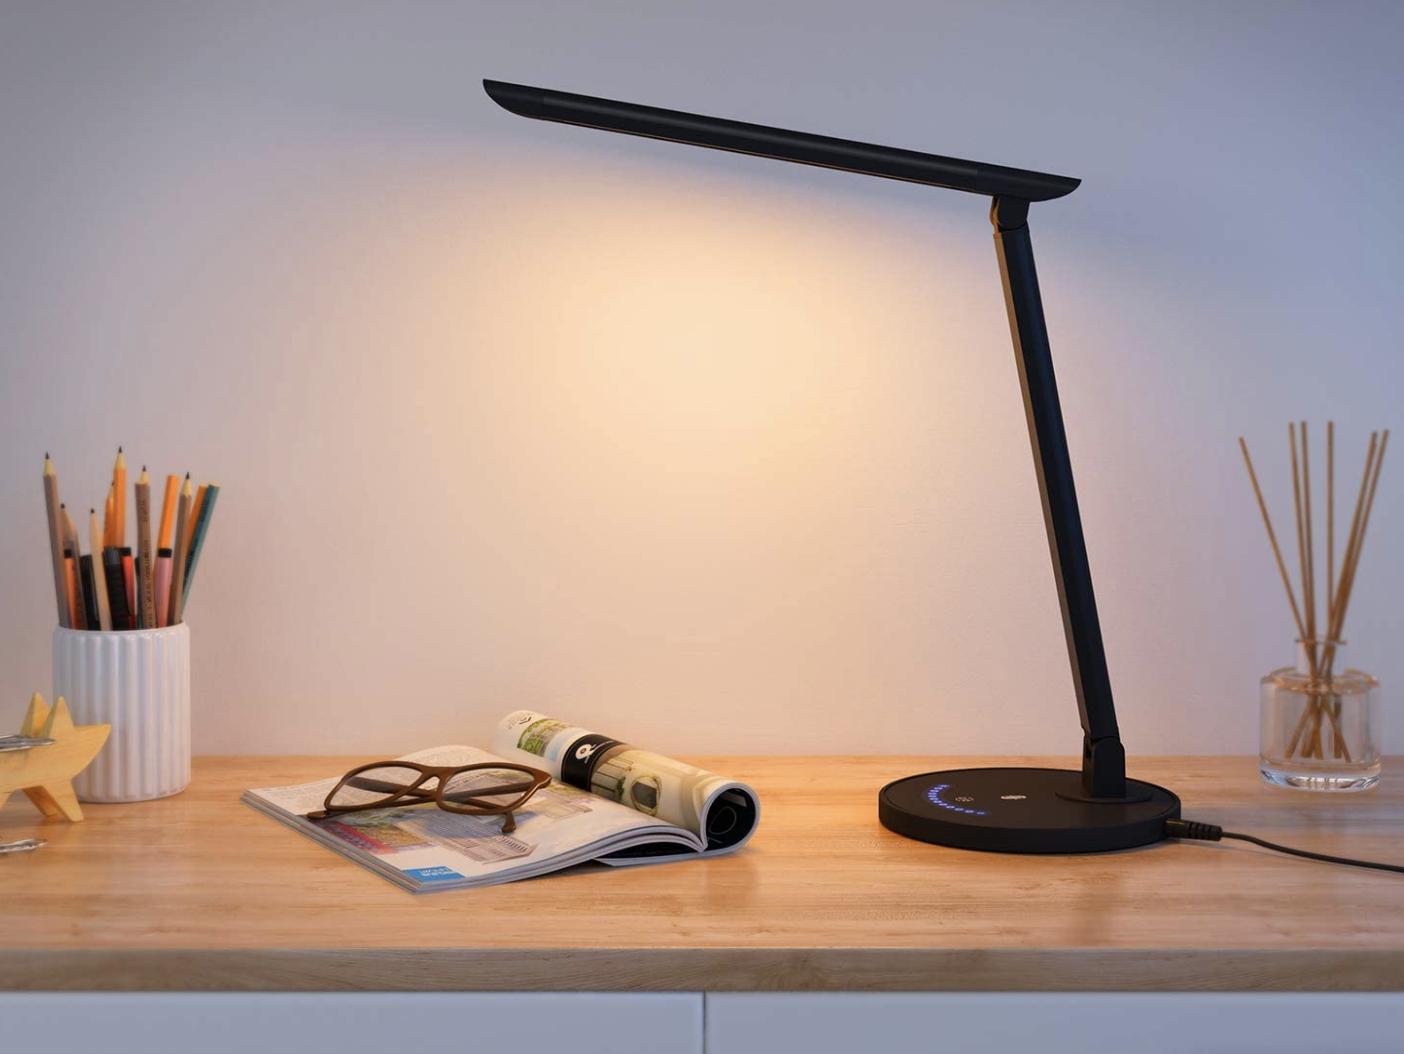 A black L-shaped desk lamp perched on a desk